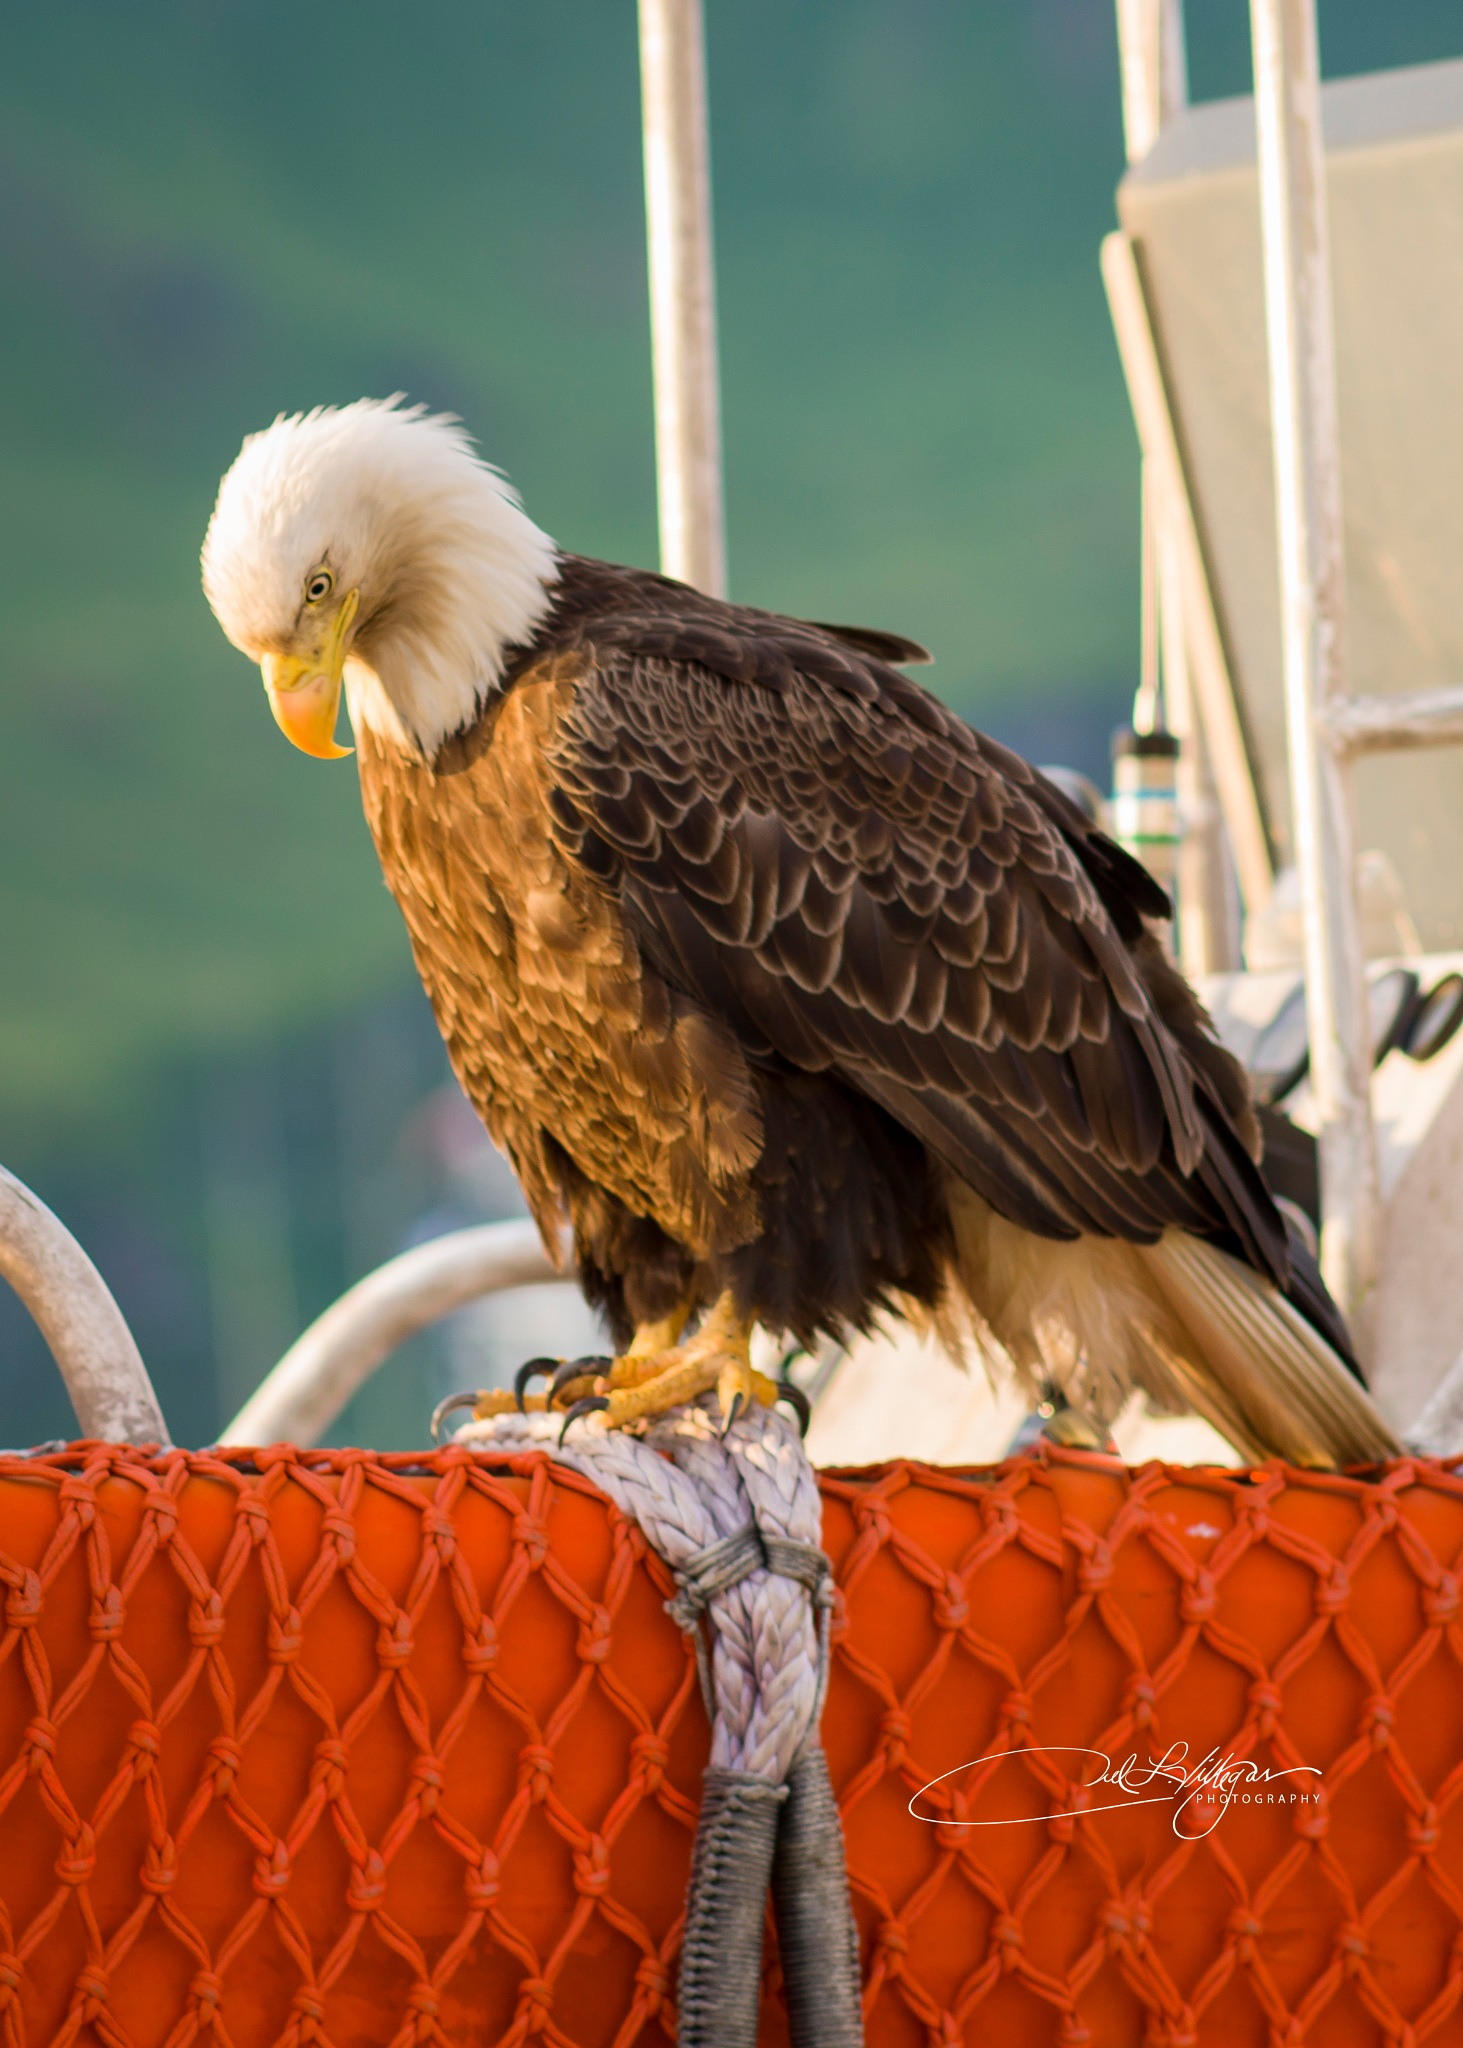 Bald Eagle of Dutch Harbor by Joel Villegas